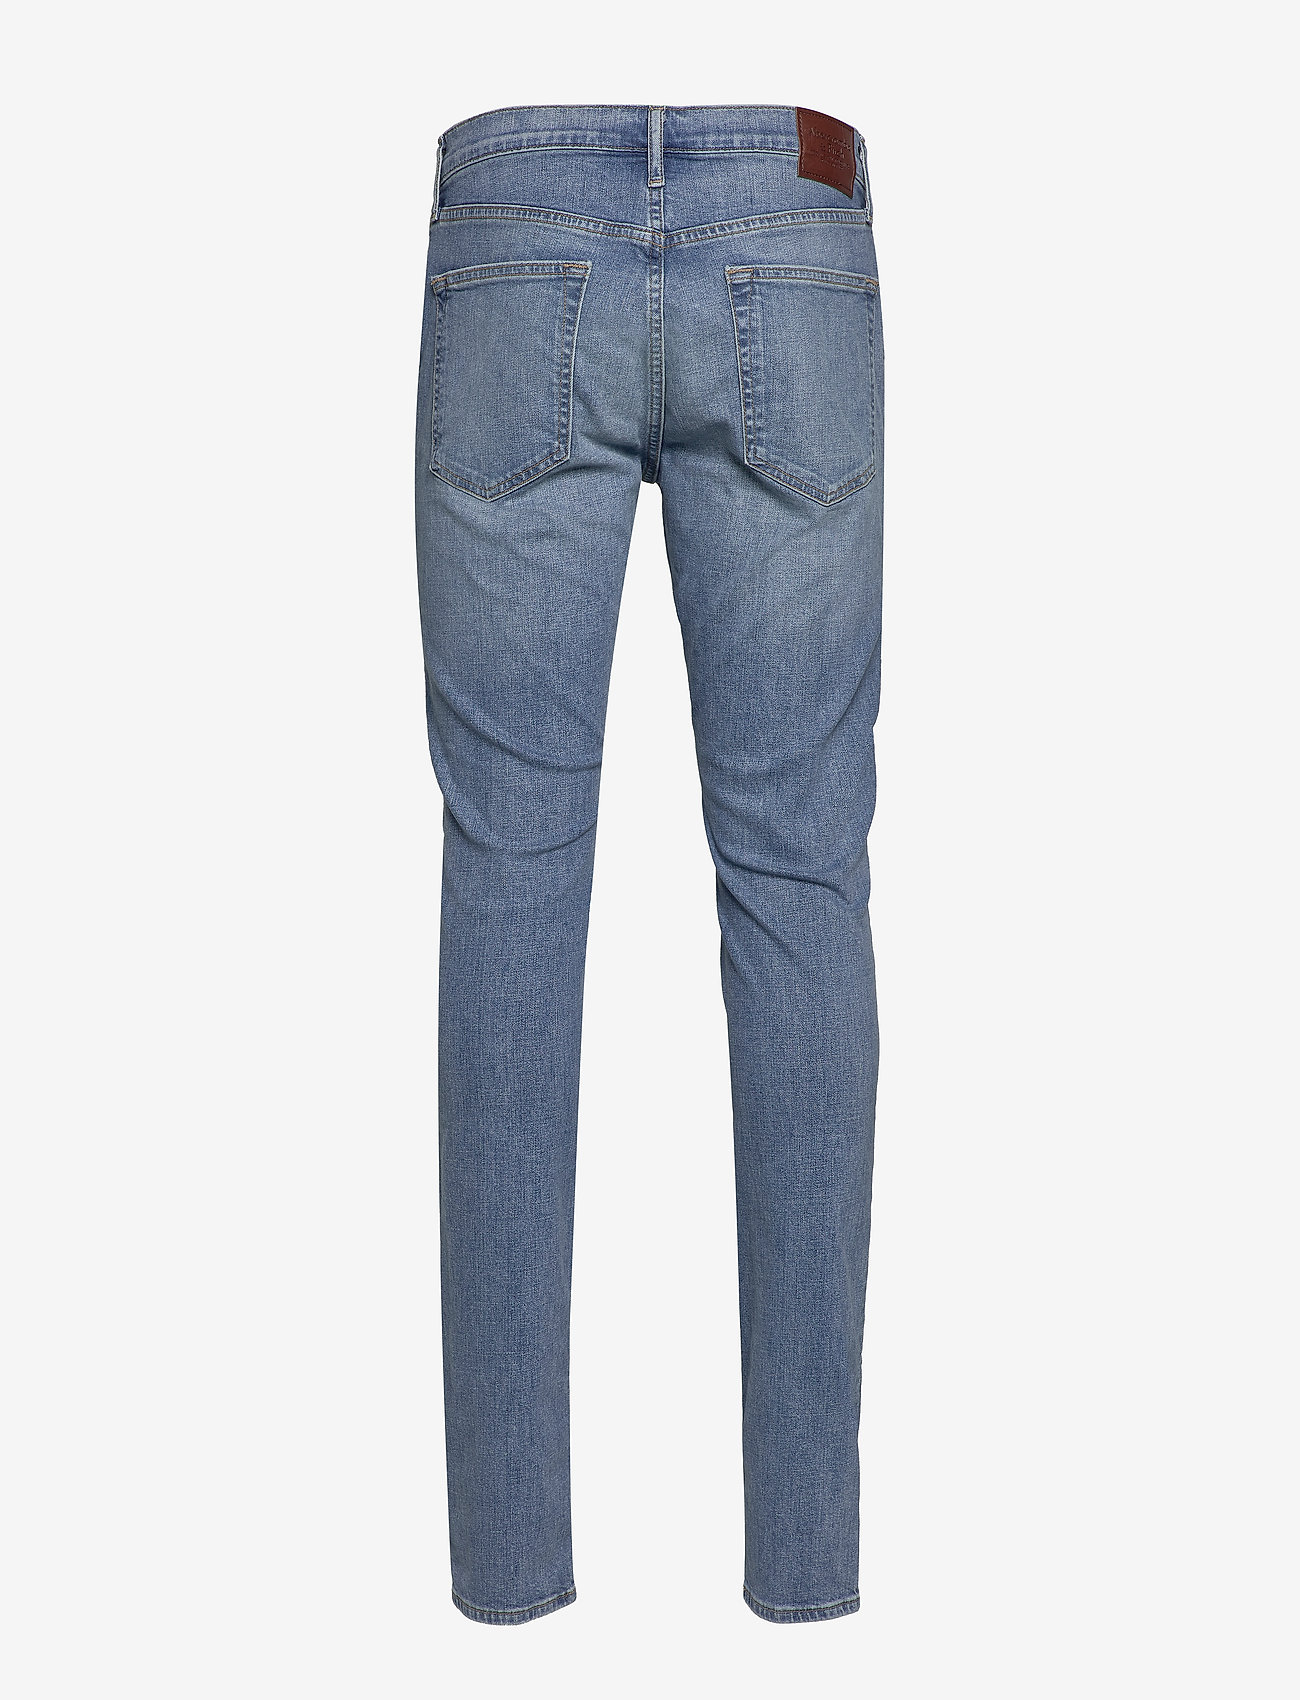 Jeans (Medium) - Abercrombie & Fitch zWMWon